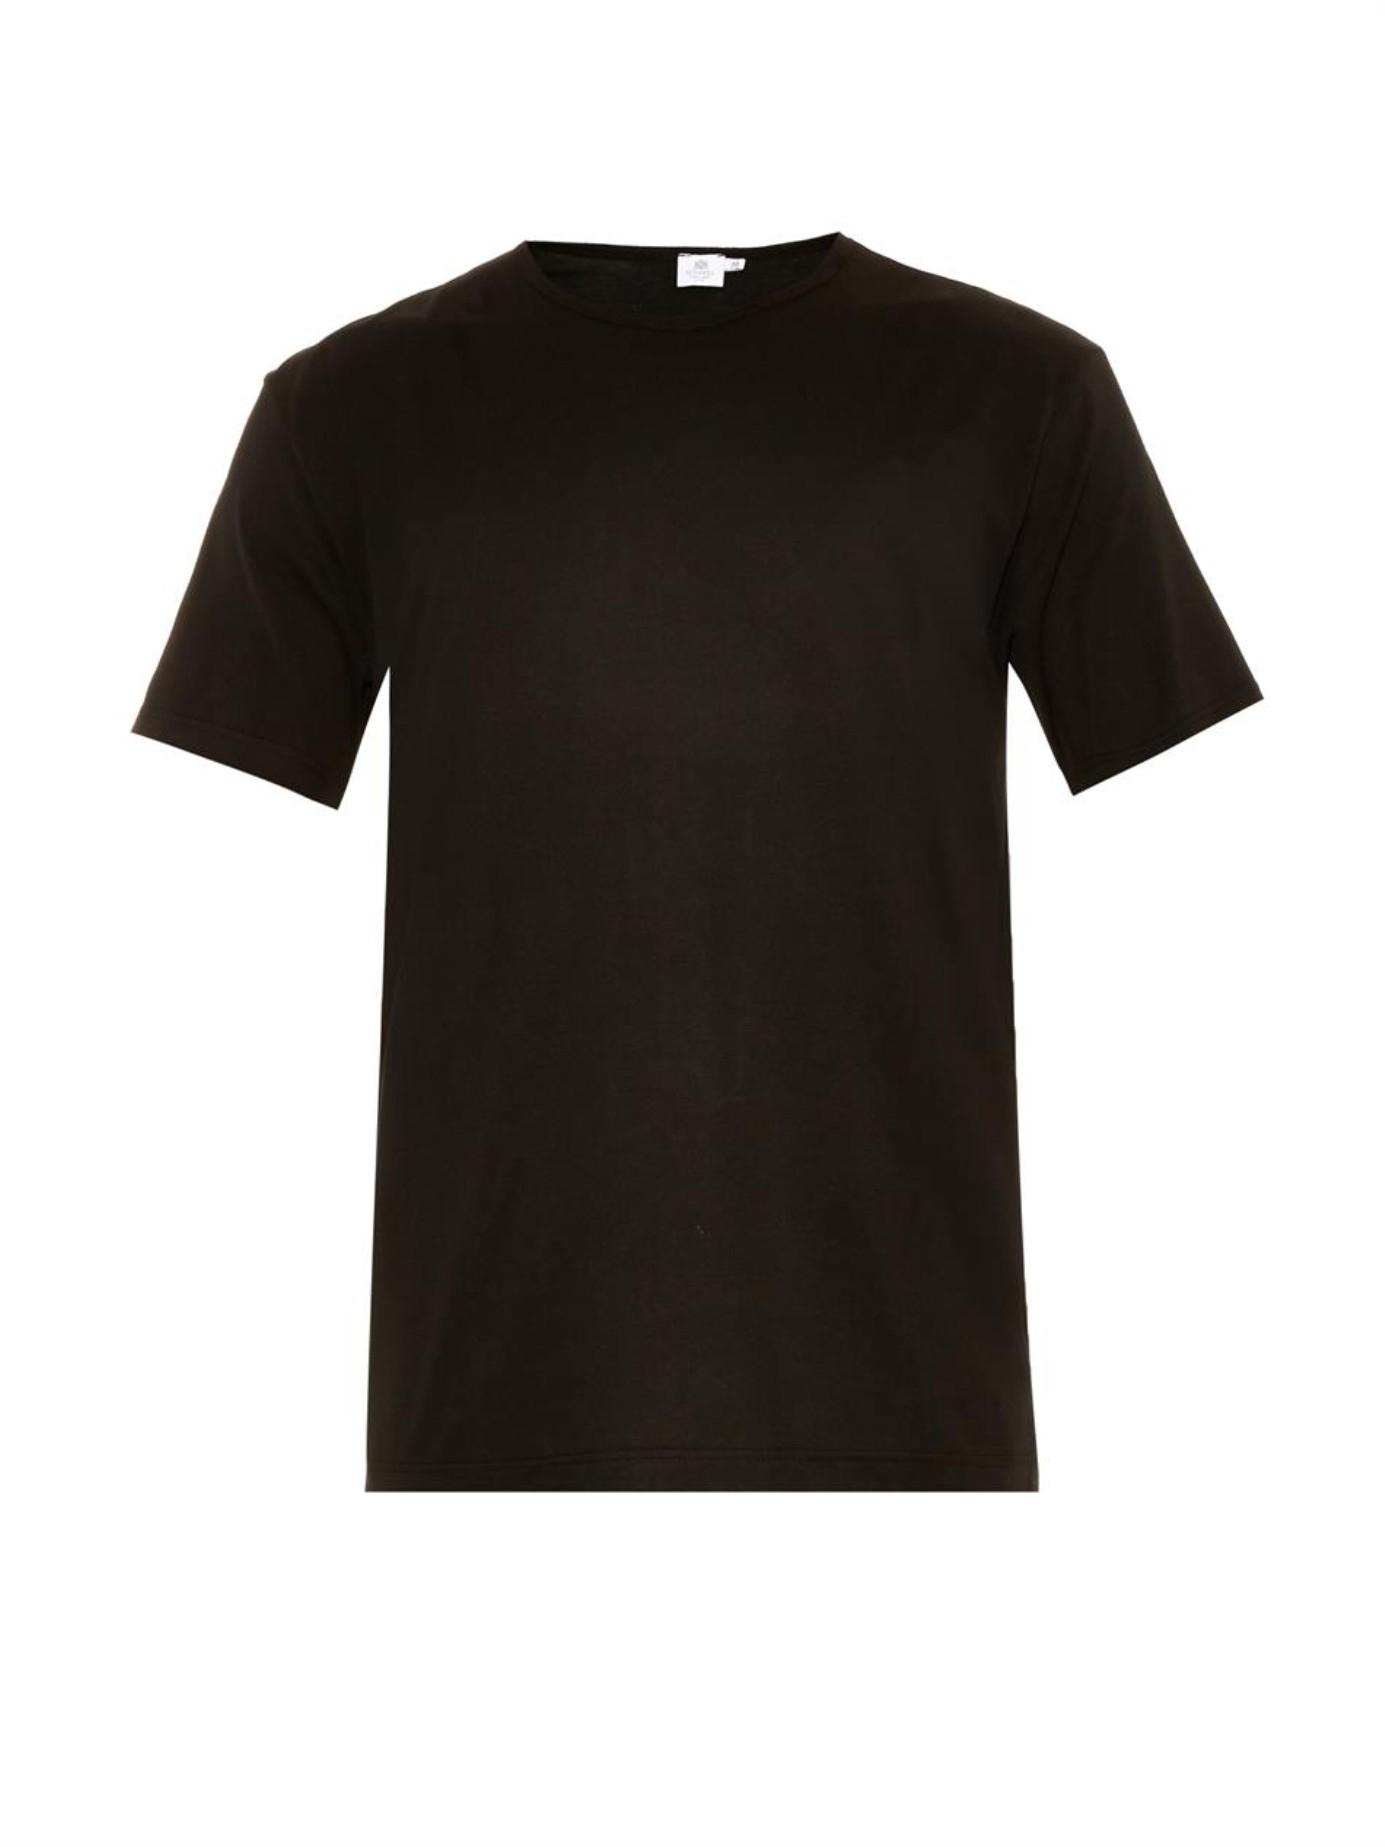 Desain t shirt jkt48 - Klein Round Neck Black T Shirt Pack Of 2 In Black For Men Lyst Gallery